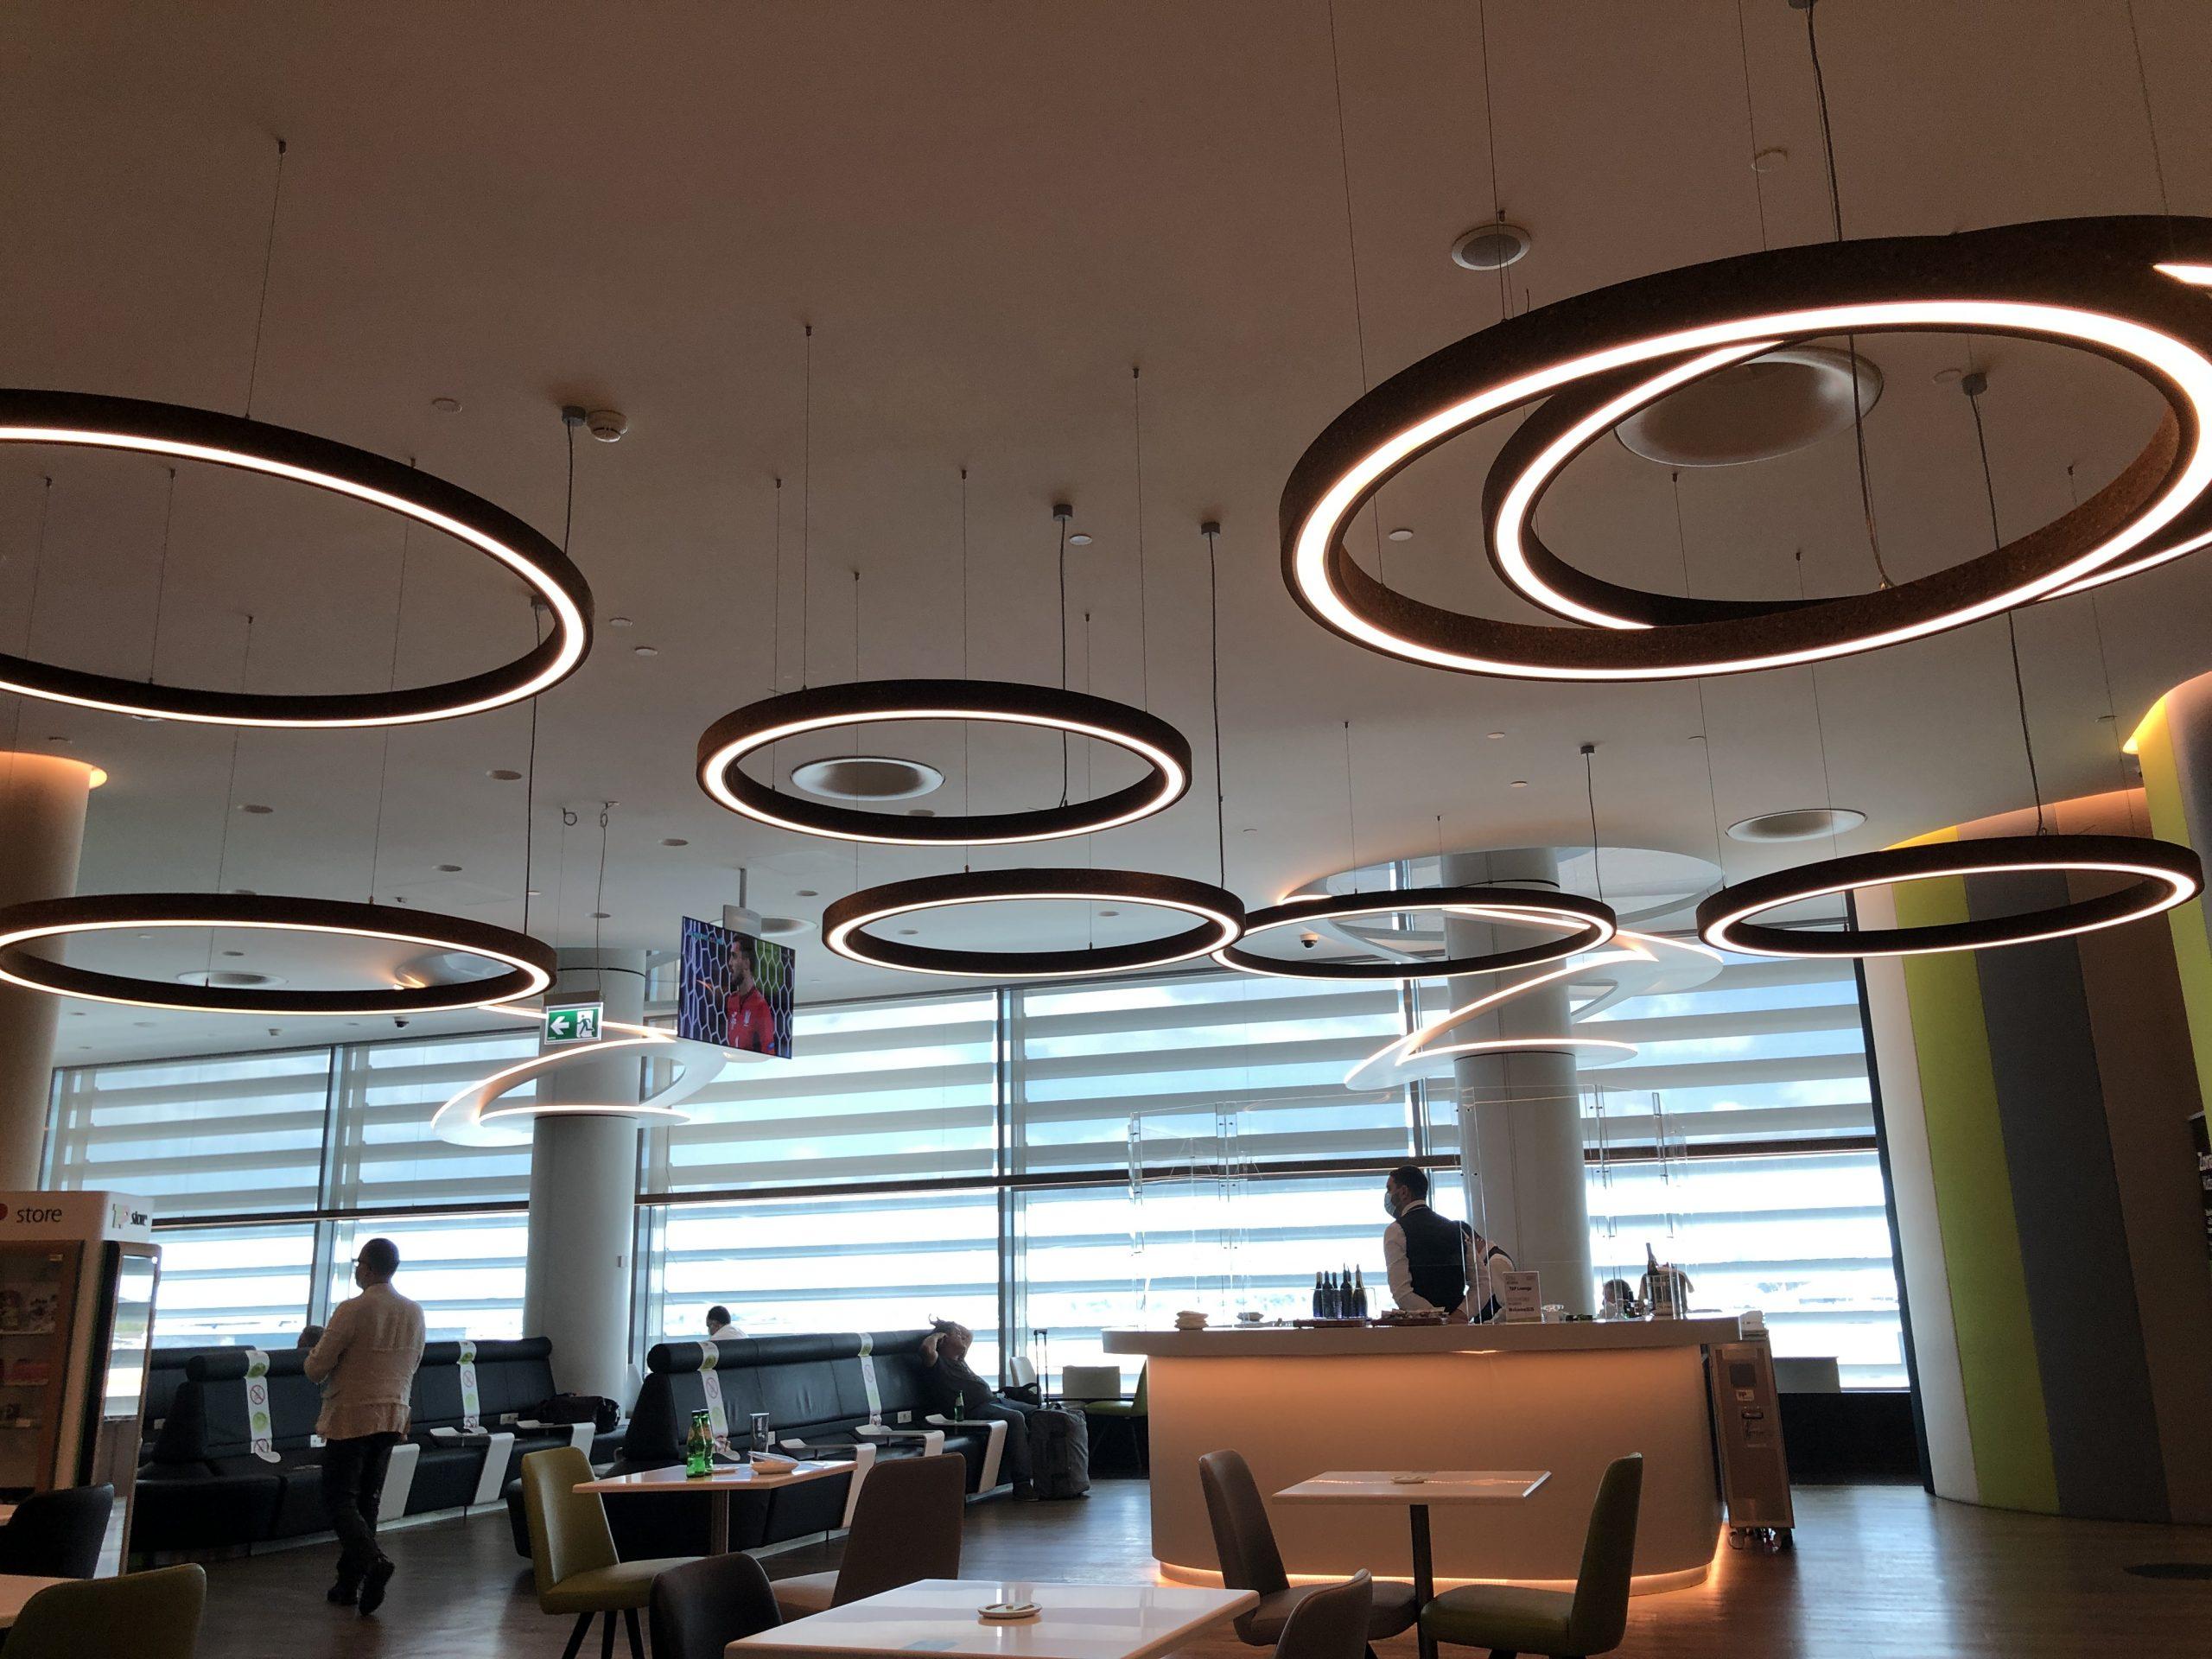 Lounge Review : リスボン空港(LIS) TAPポルトガル航空(TP) TAPプレミアムラウンジ(TAP Premium Lounge)(シェンゲン協定加盟国内)